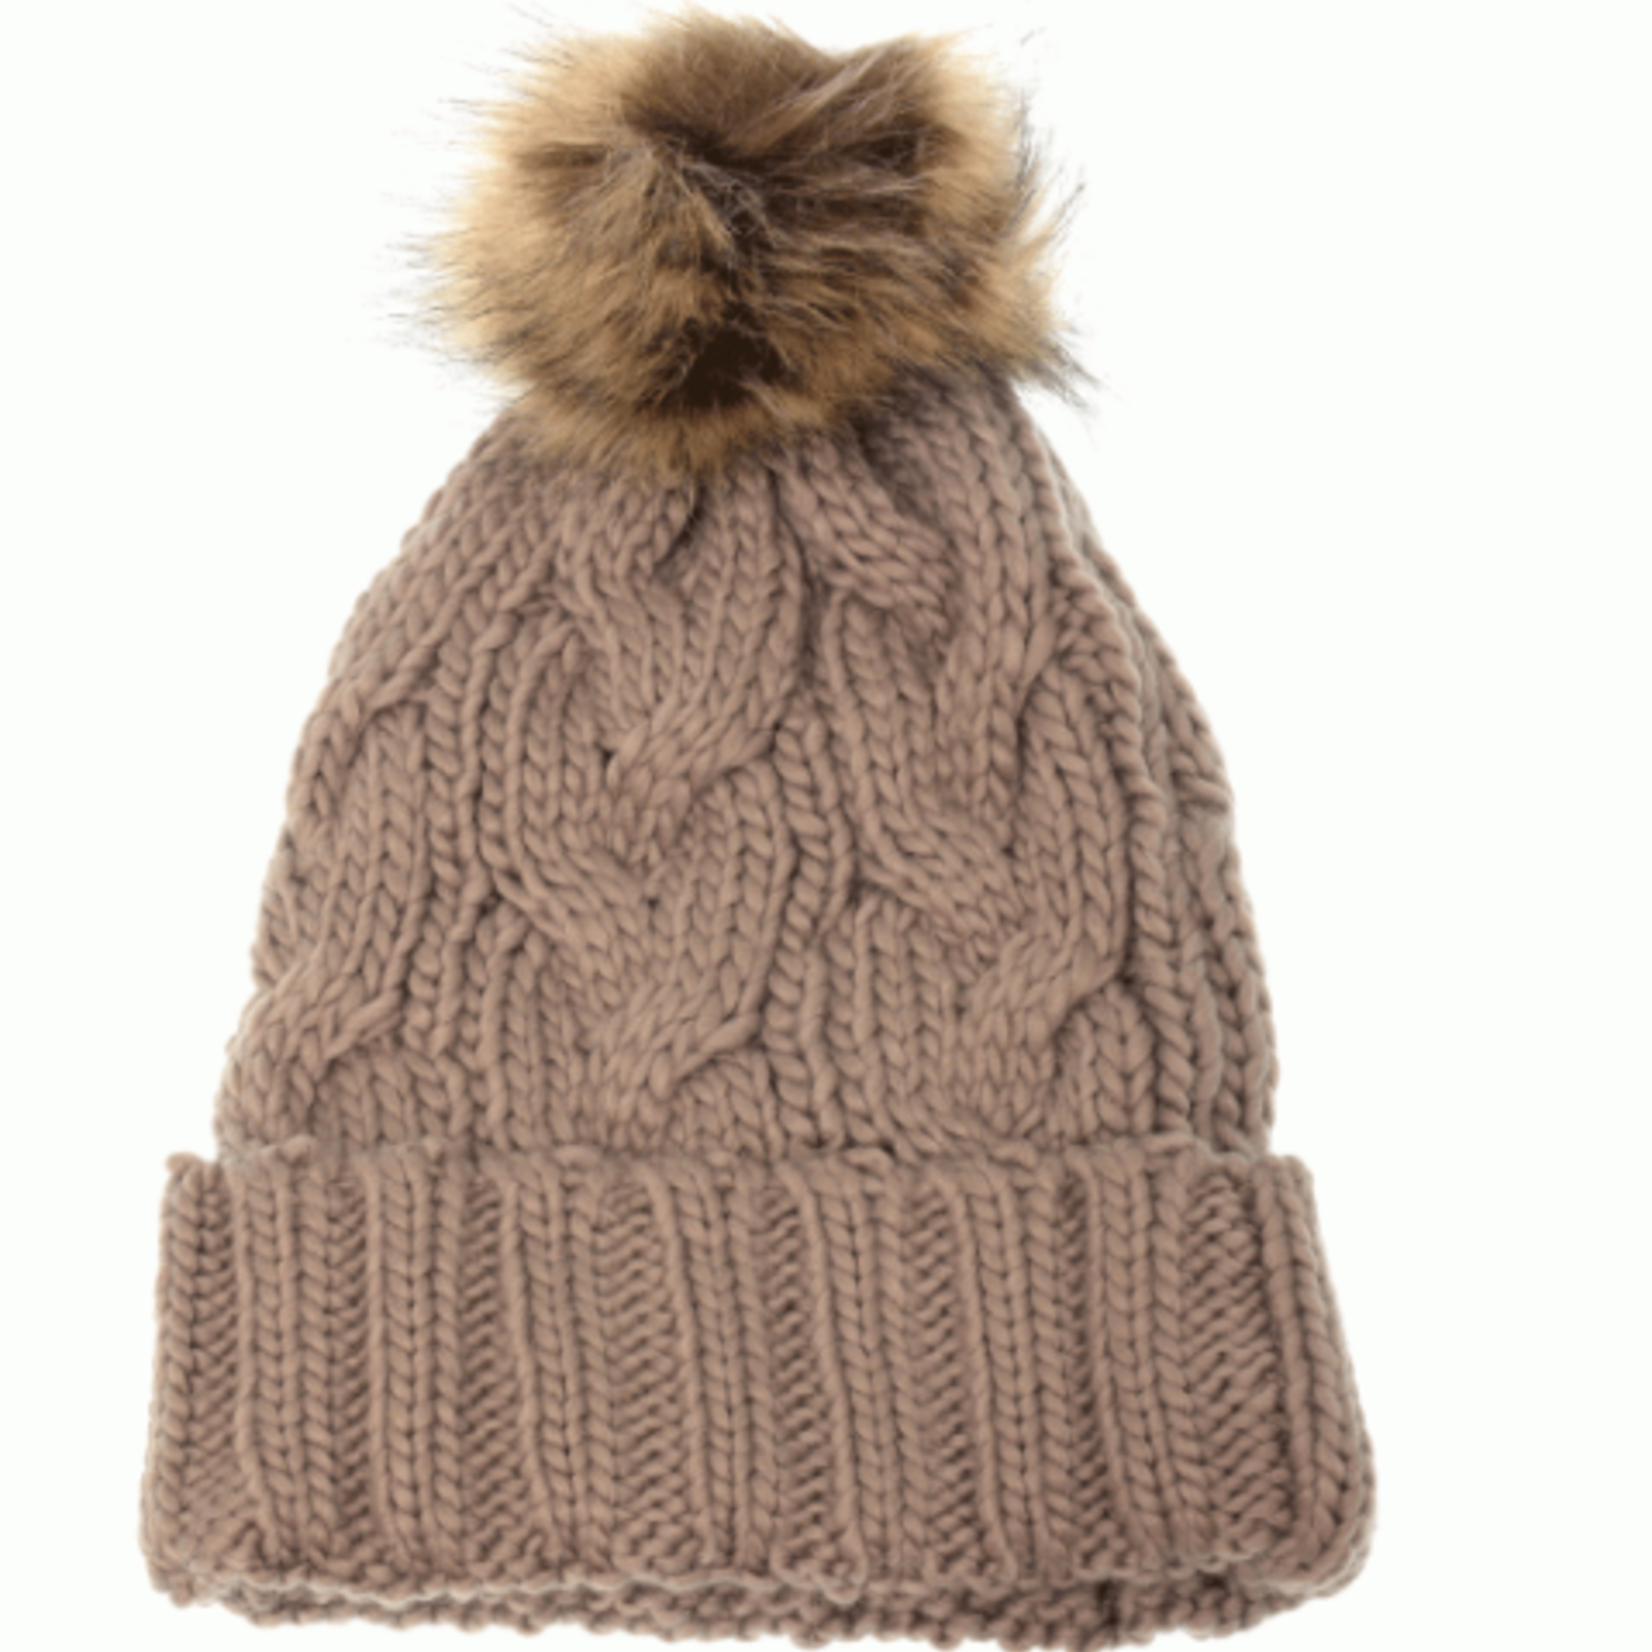 Joy Susan Joy Susan Cable Knit Pom Pom Hat - P-122443